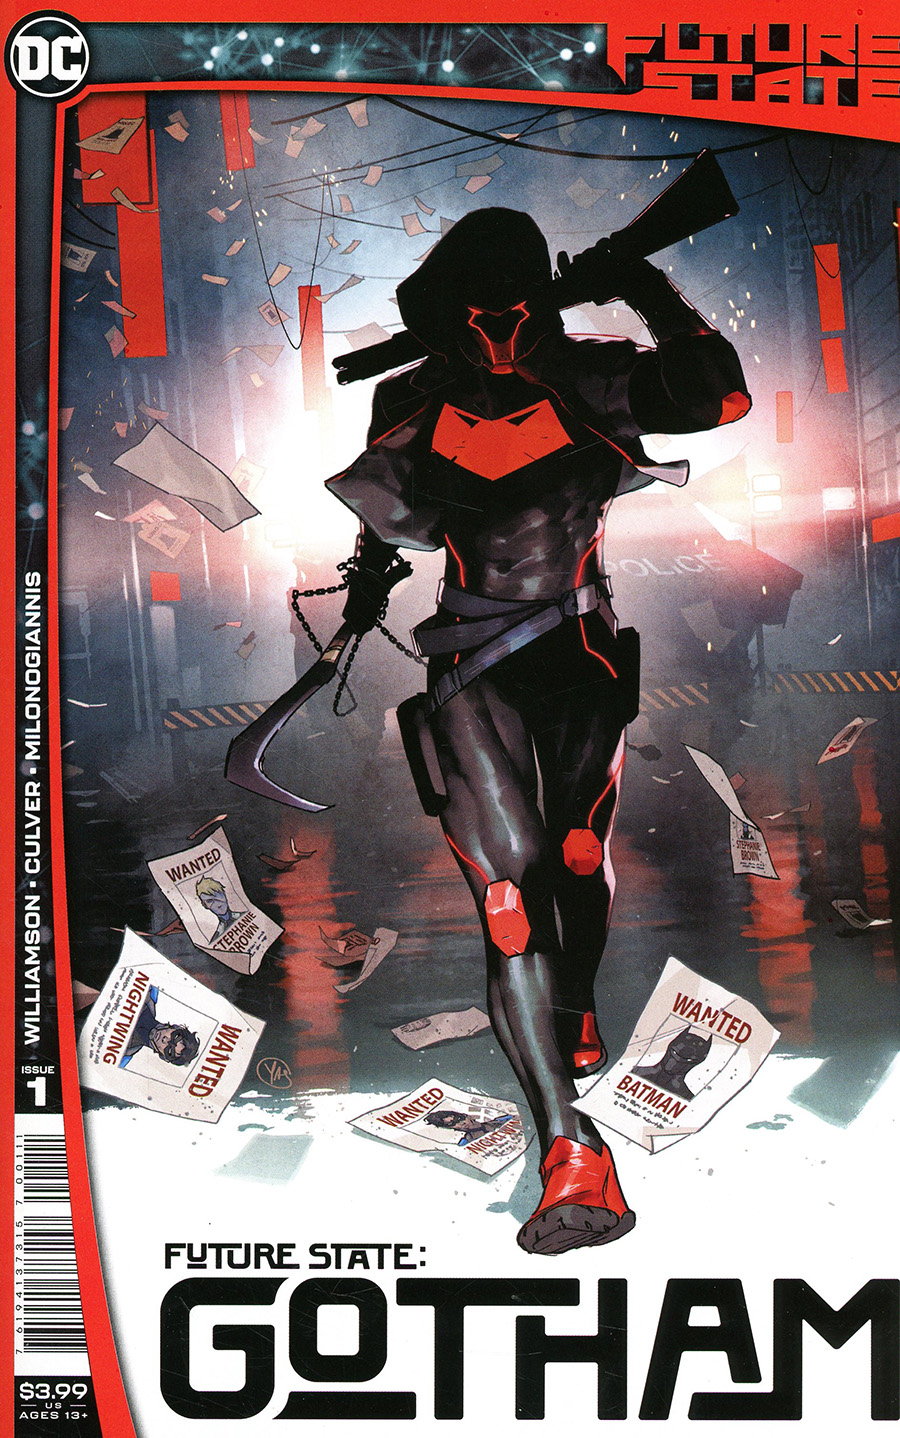 Future State Gotham #1 Cover A Regular Yasmine Putri Cover